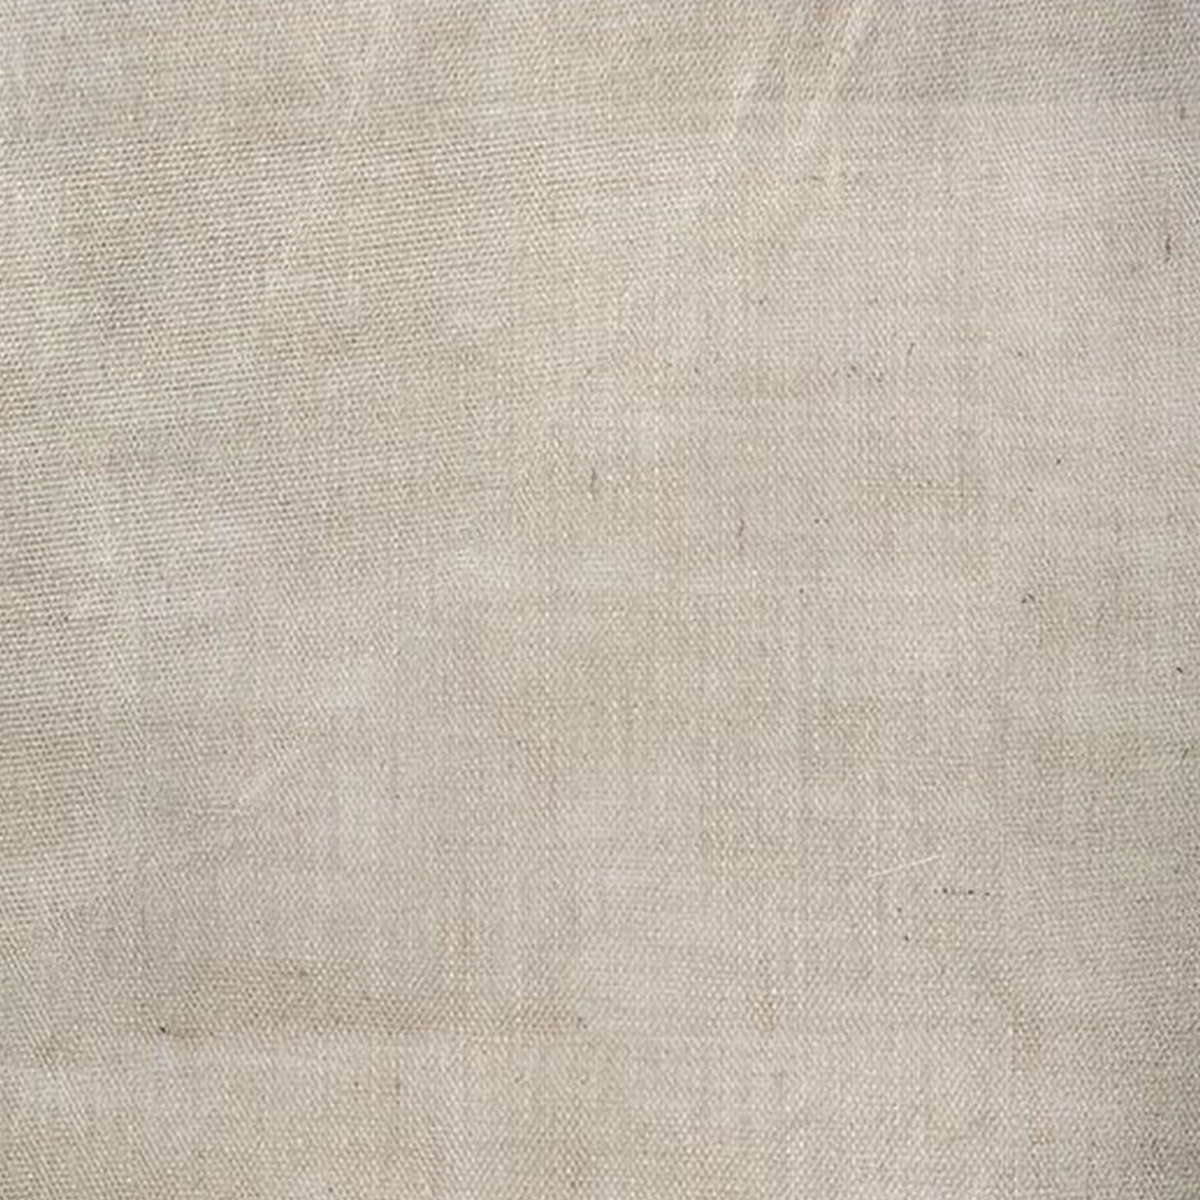 24x24-FabricFolio-Ivory-FB01